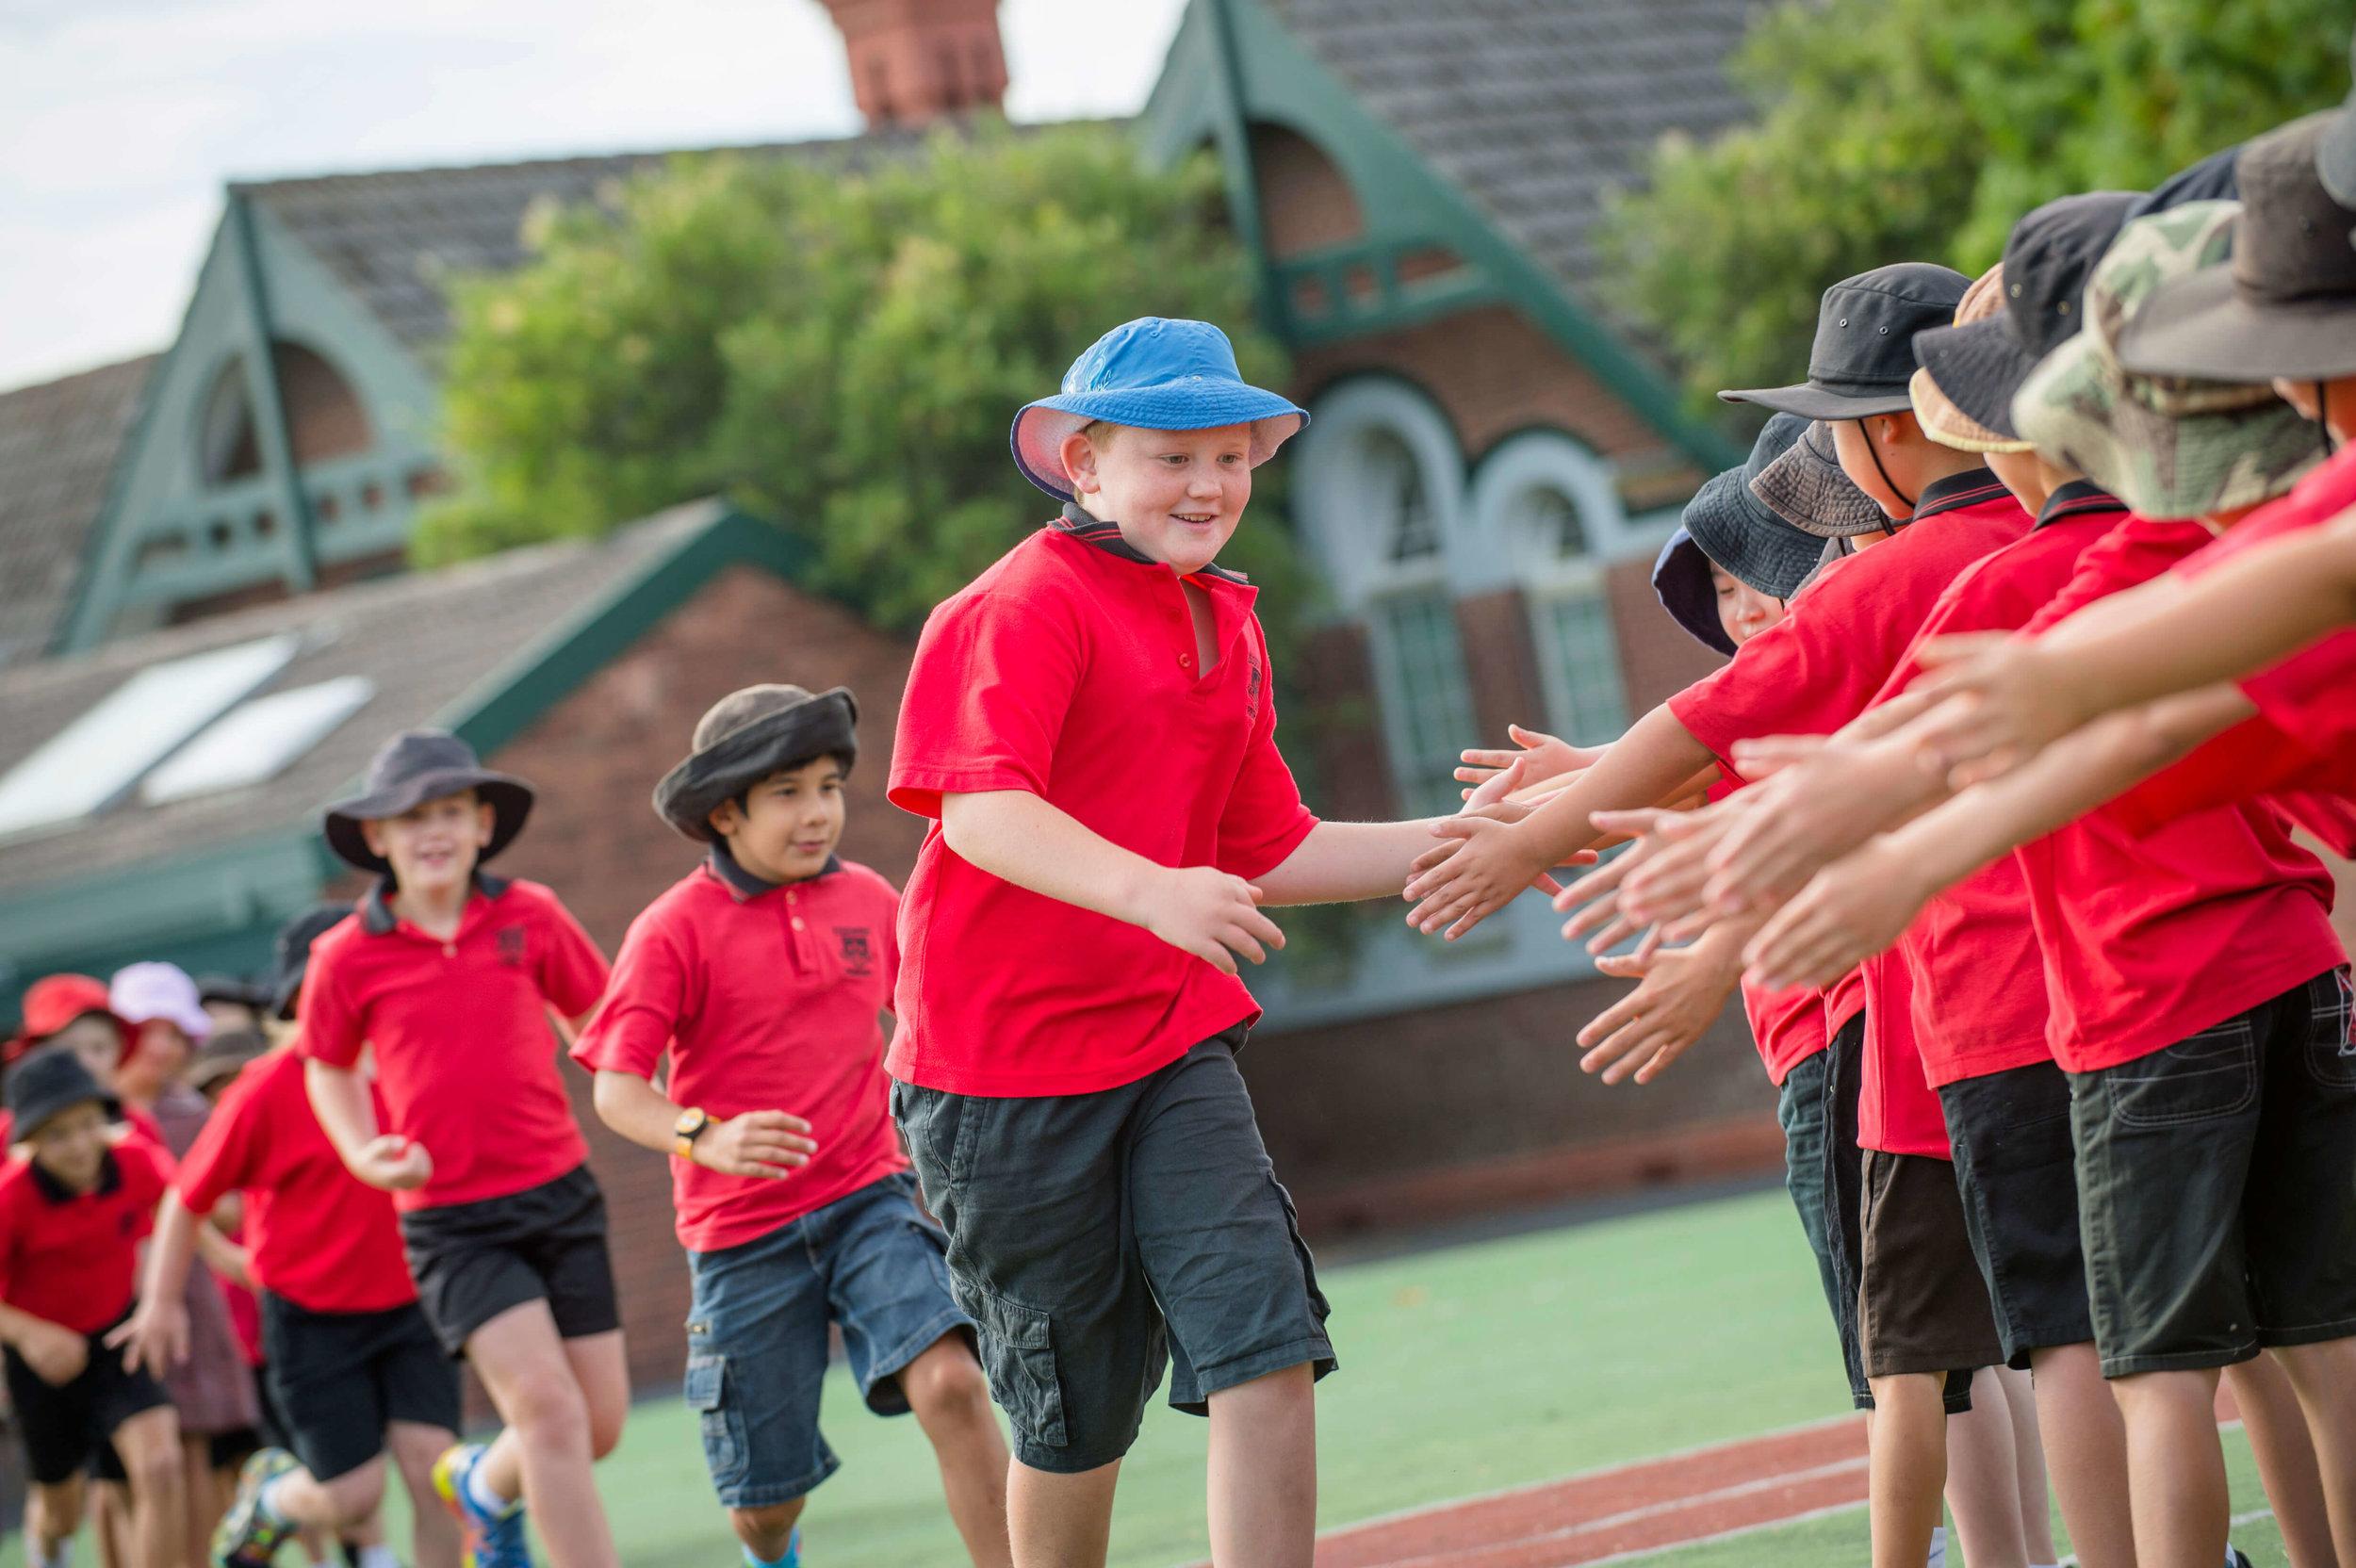 CUA-School-Fun-Run-Cross-Country-2.jpg